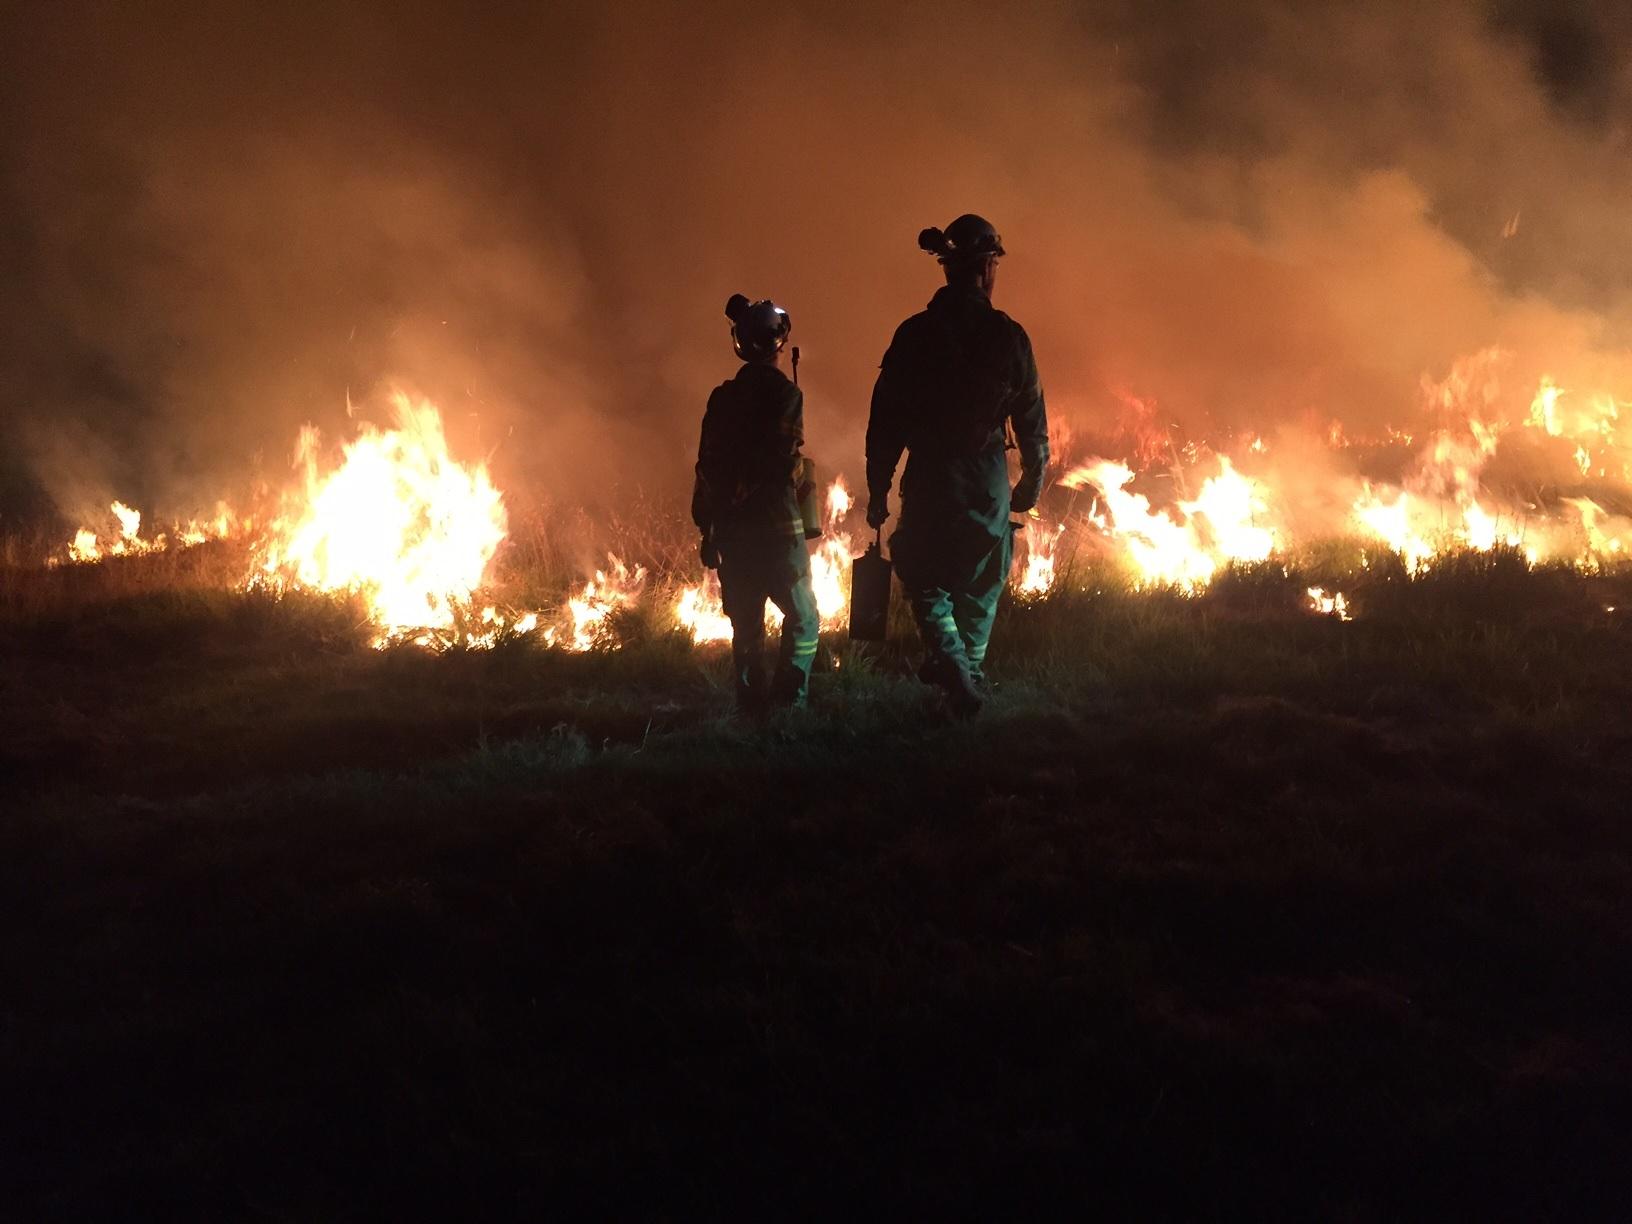 carrum downs bushfire